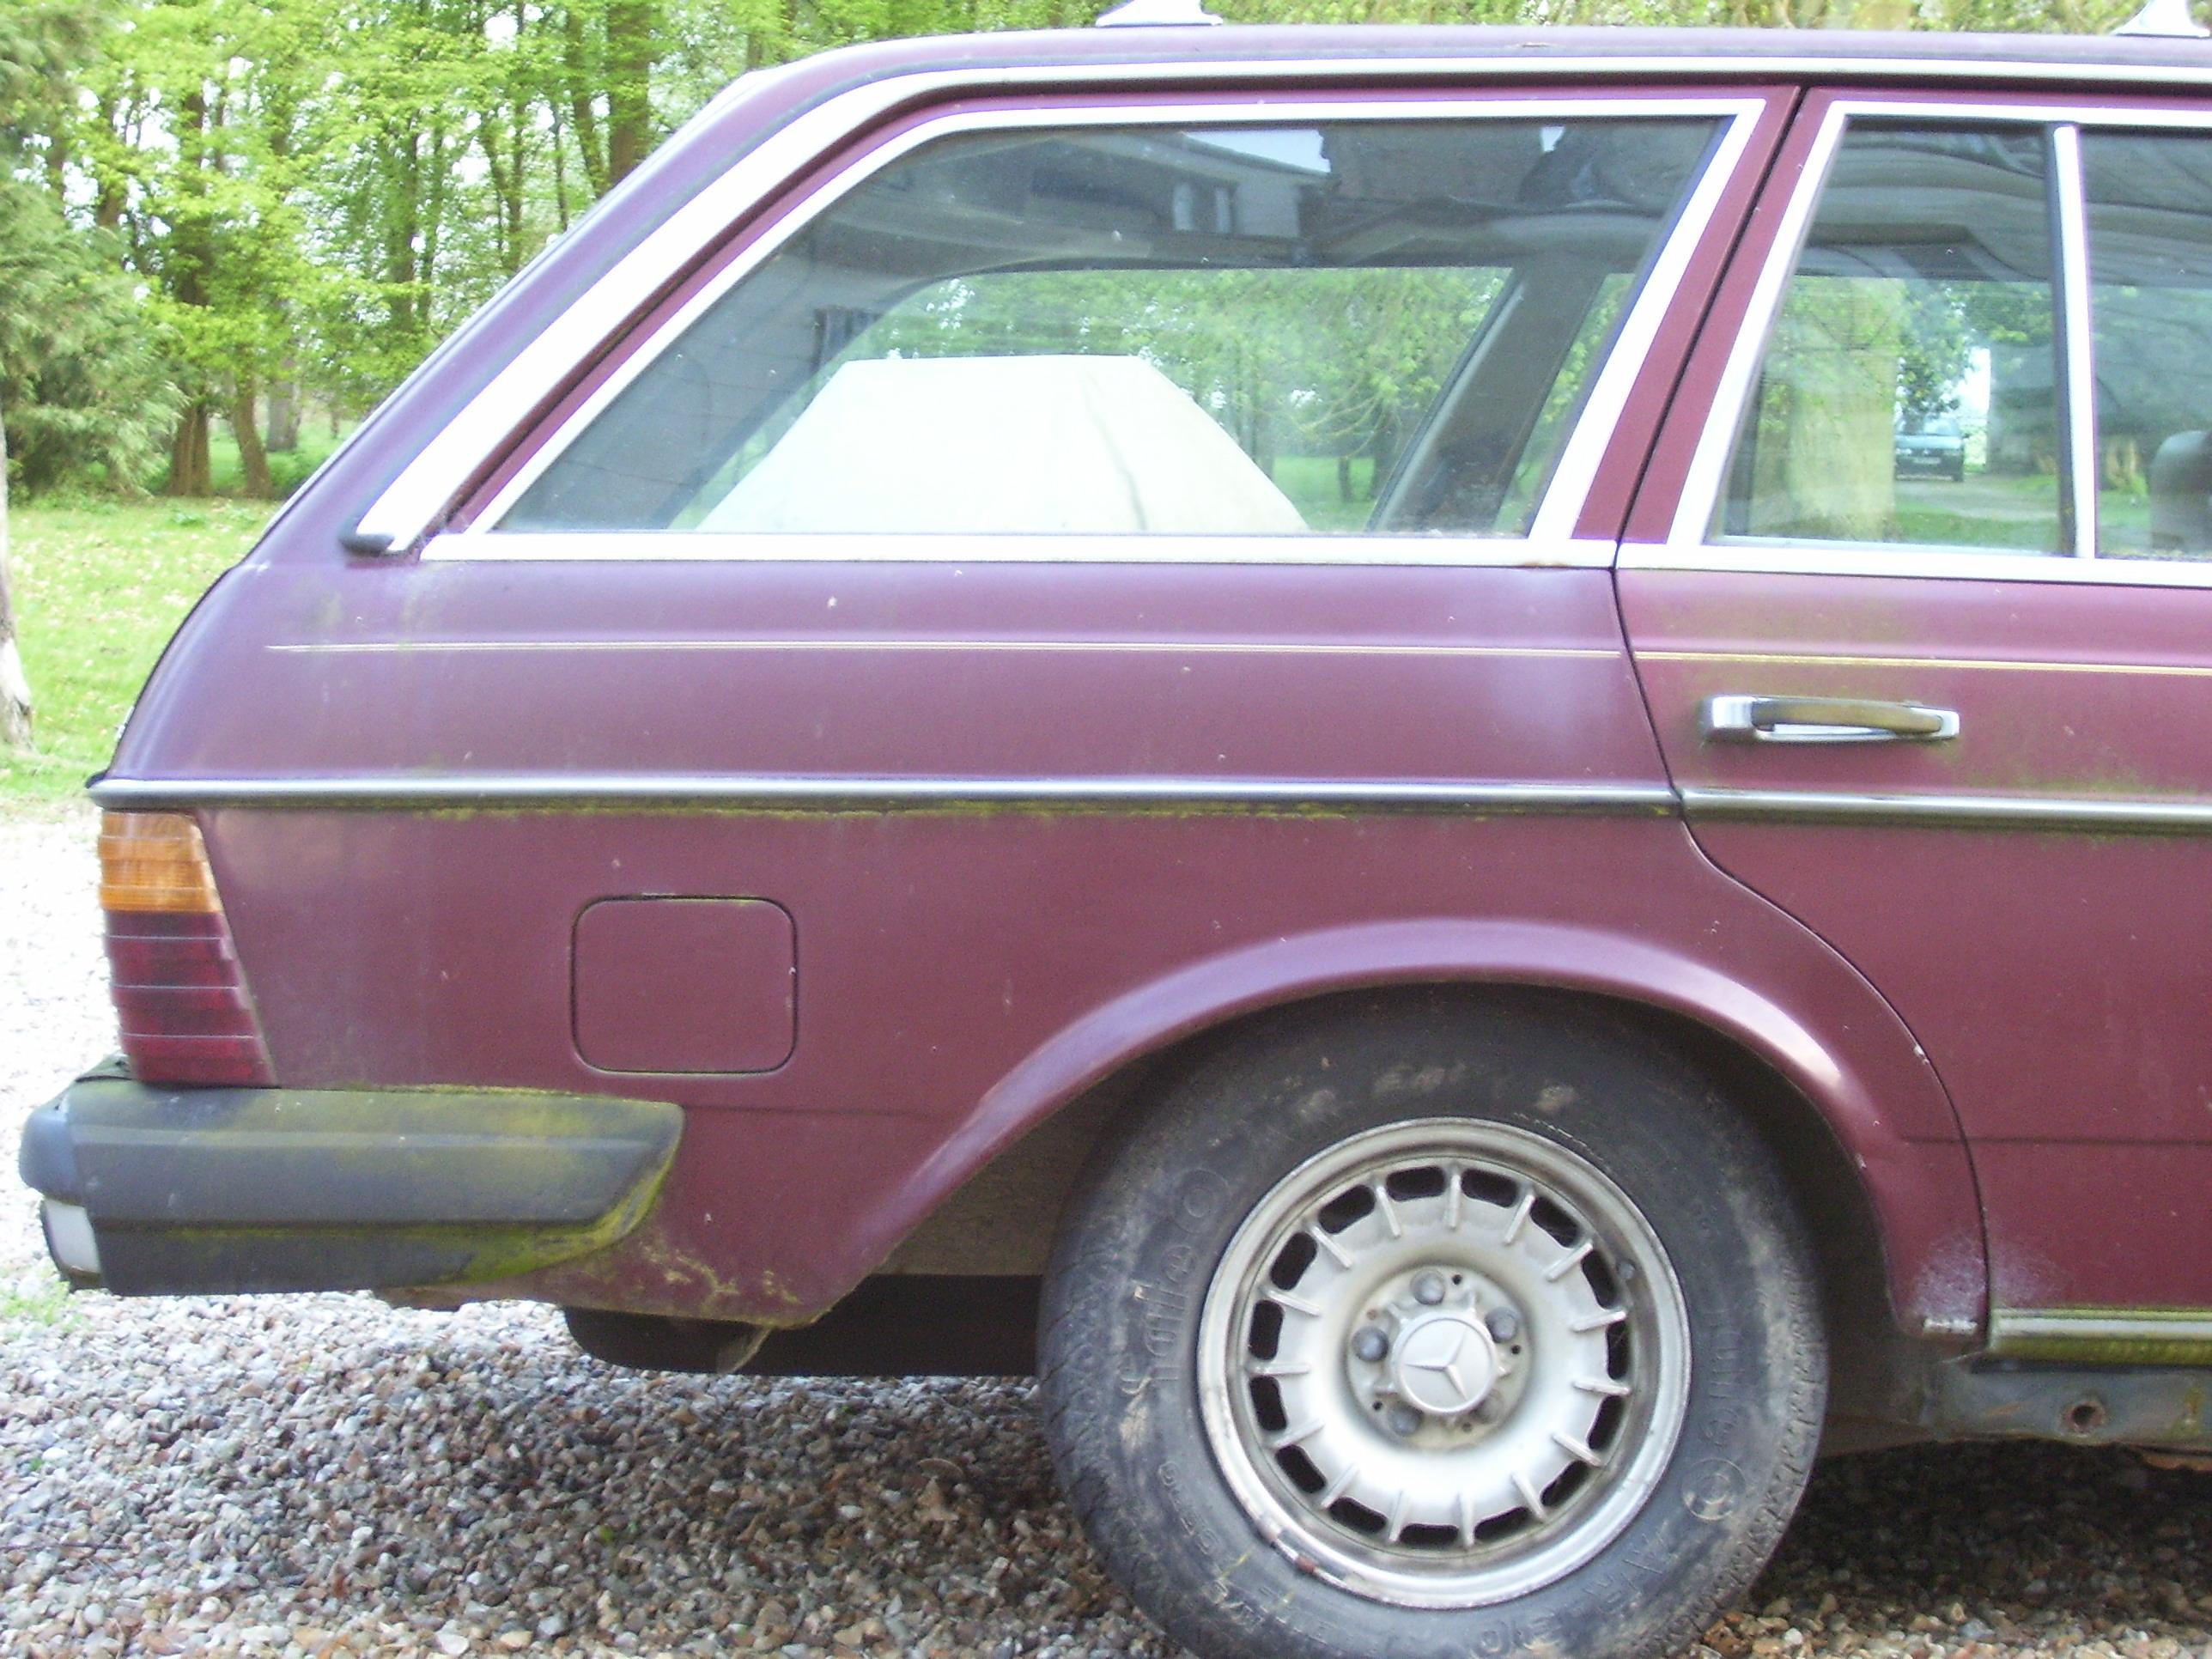 makkes wheel tire car backend boot red volkswagen transportation windows station wagon